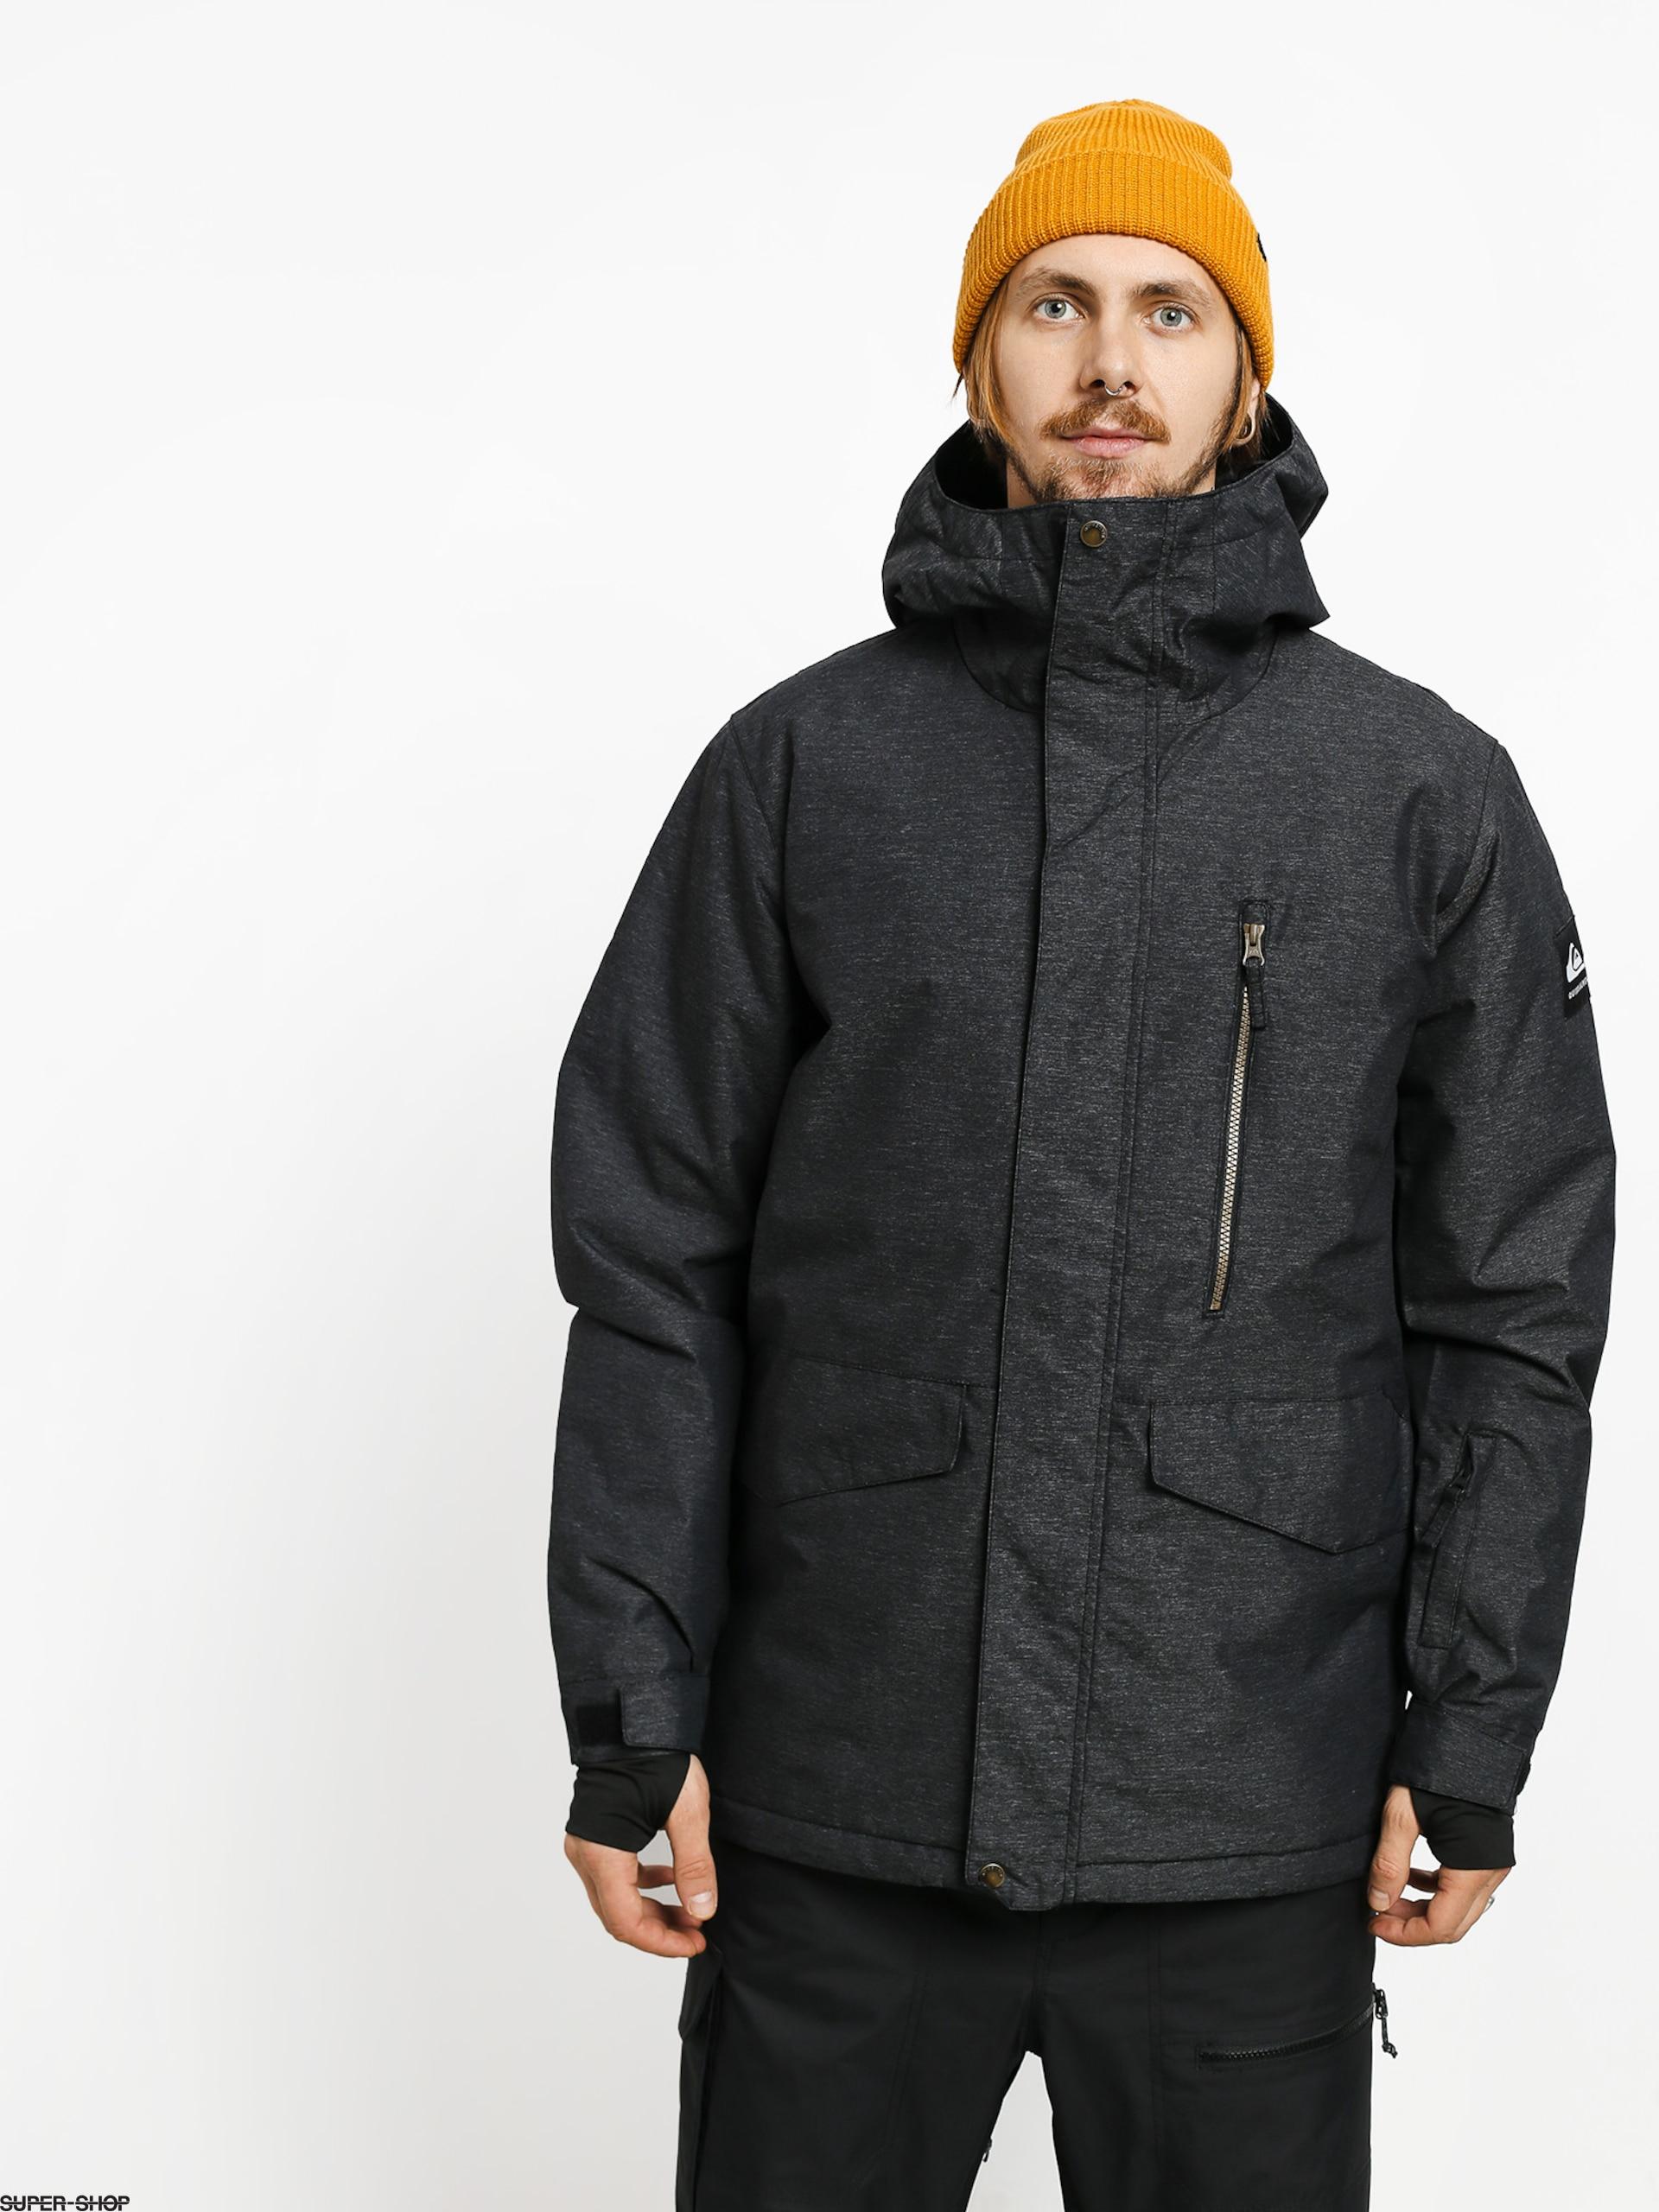 Quiksilver Mission Snowboard Jacket L